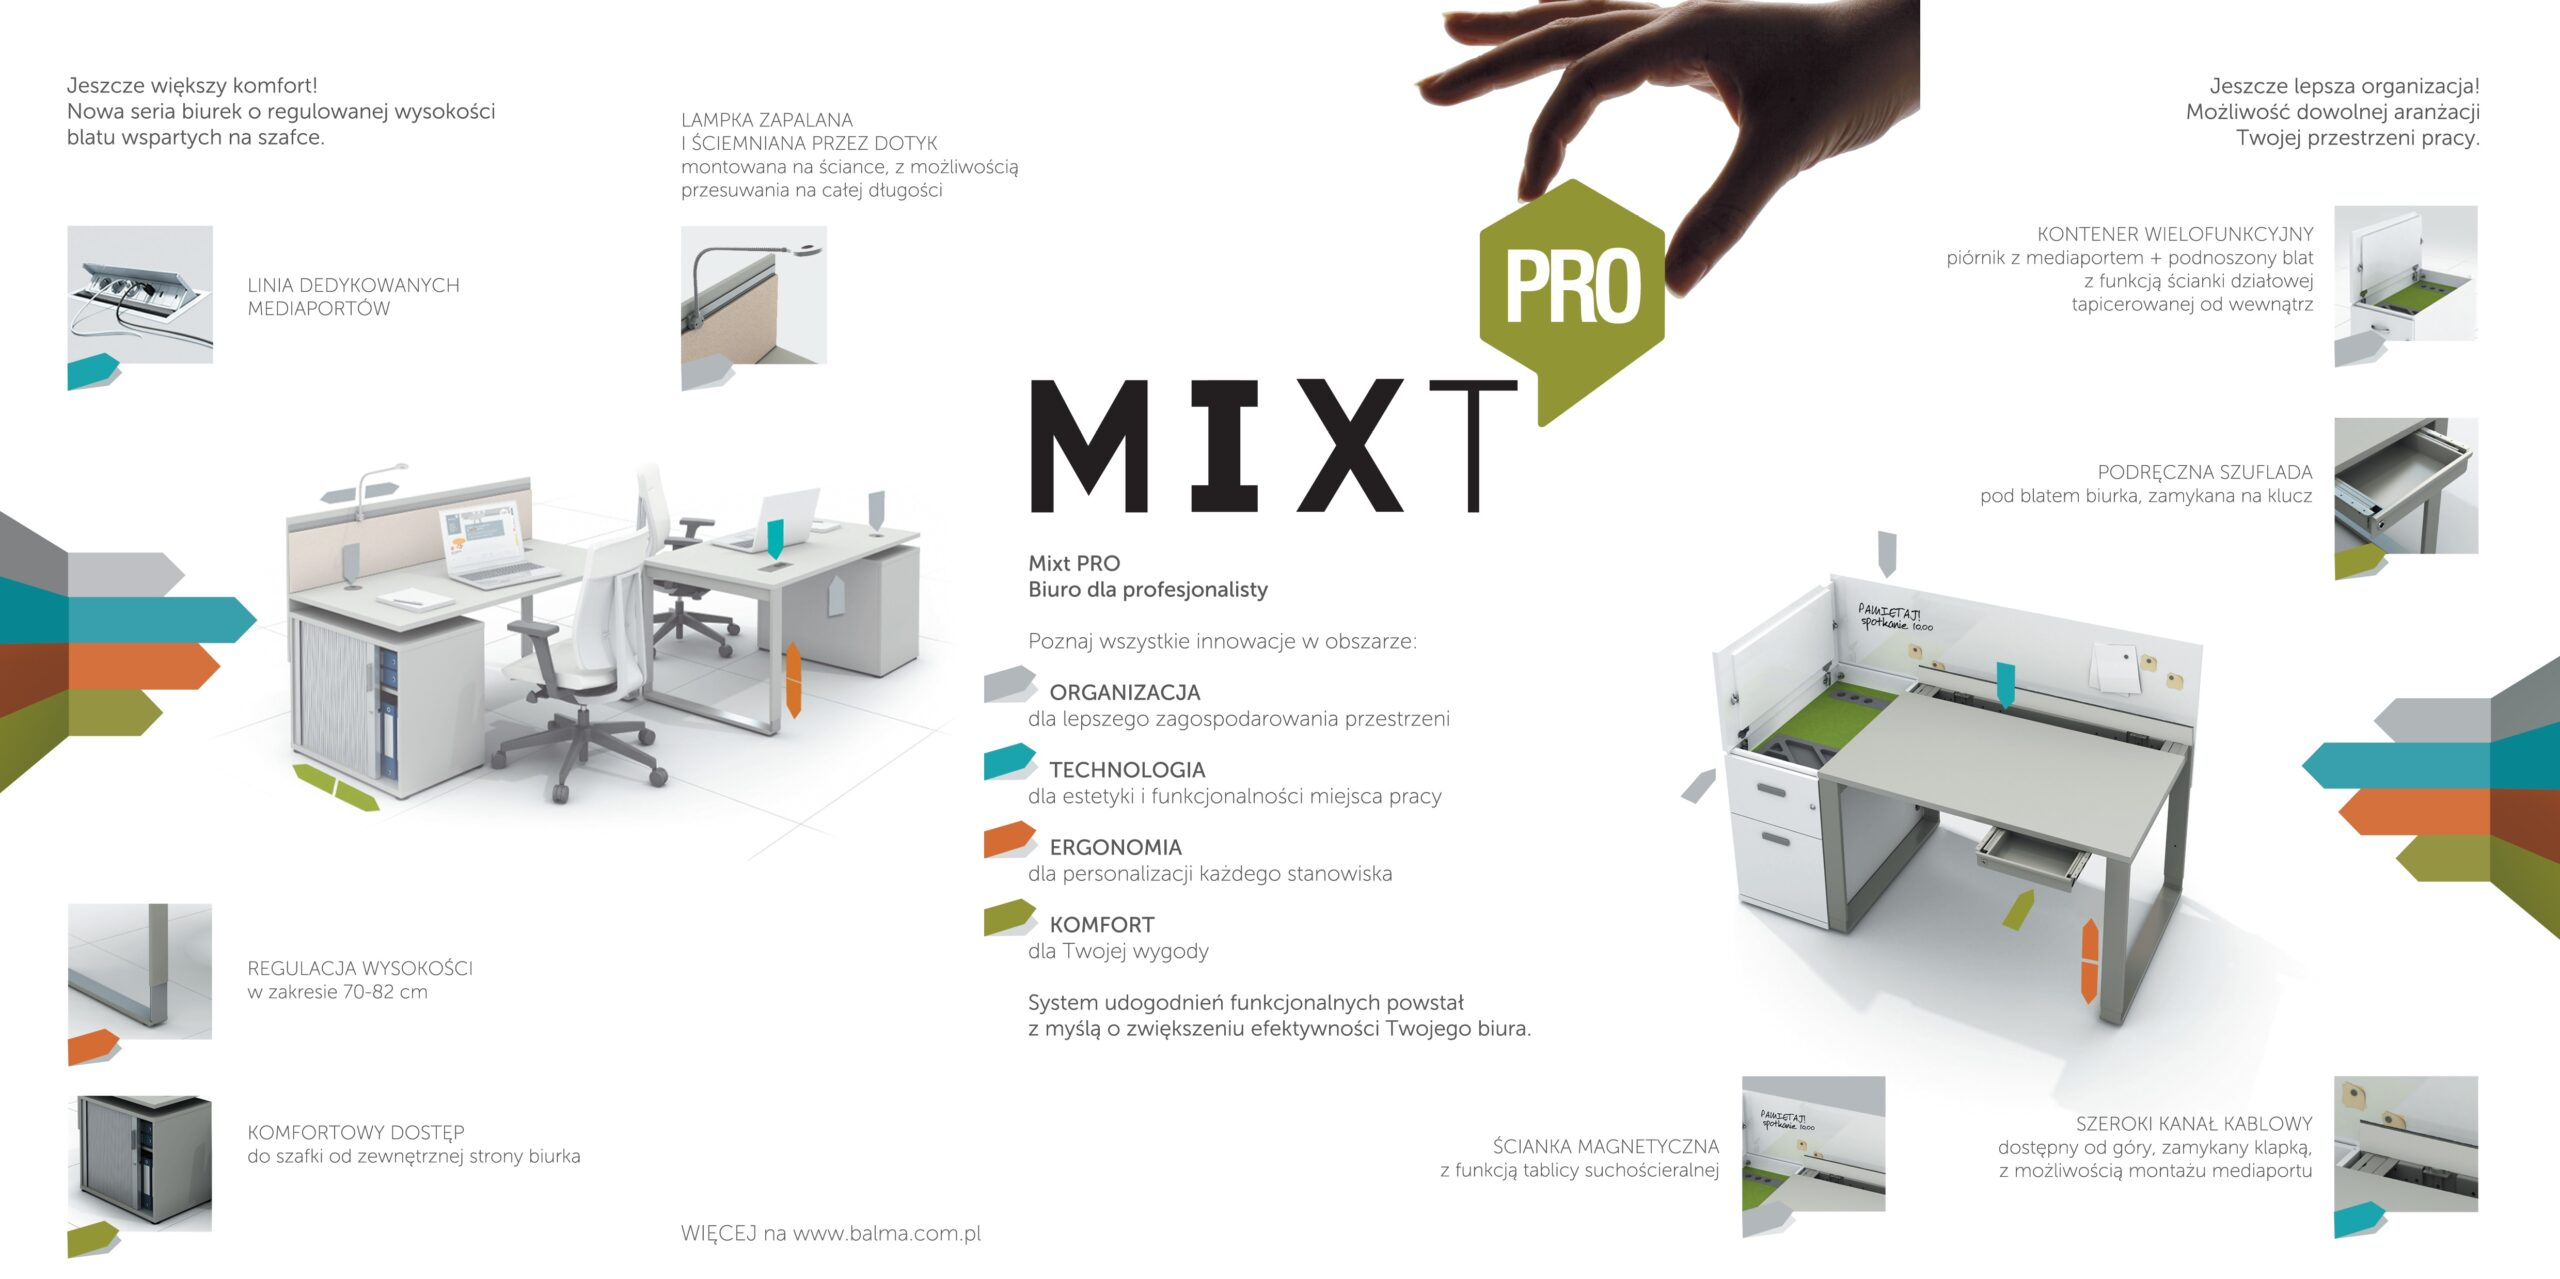 mixt pro ulotka ergonomia biurka